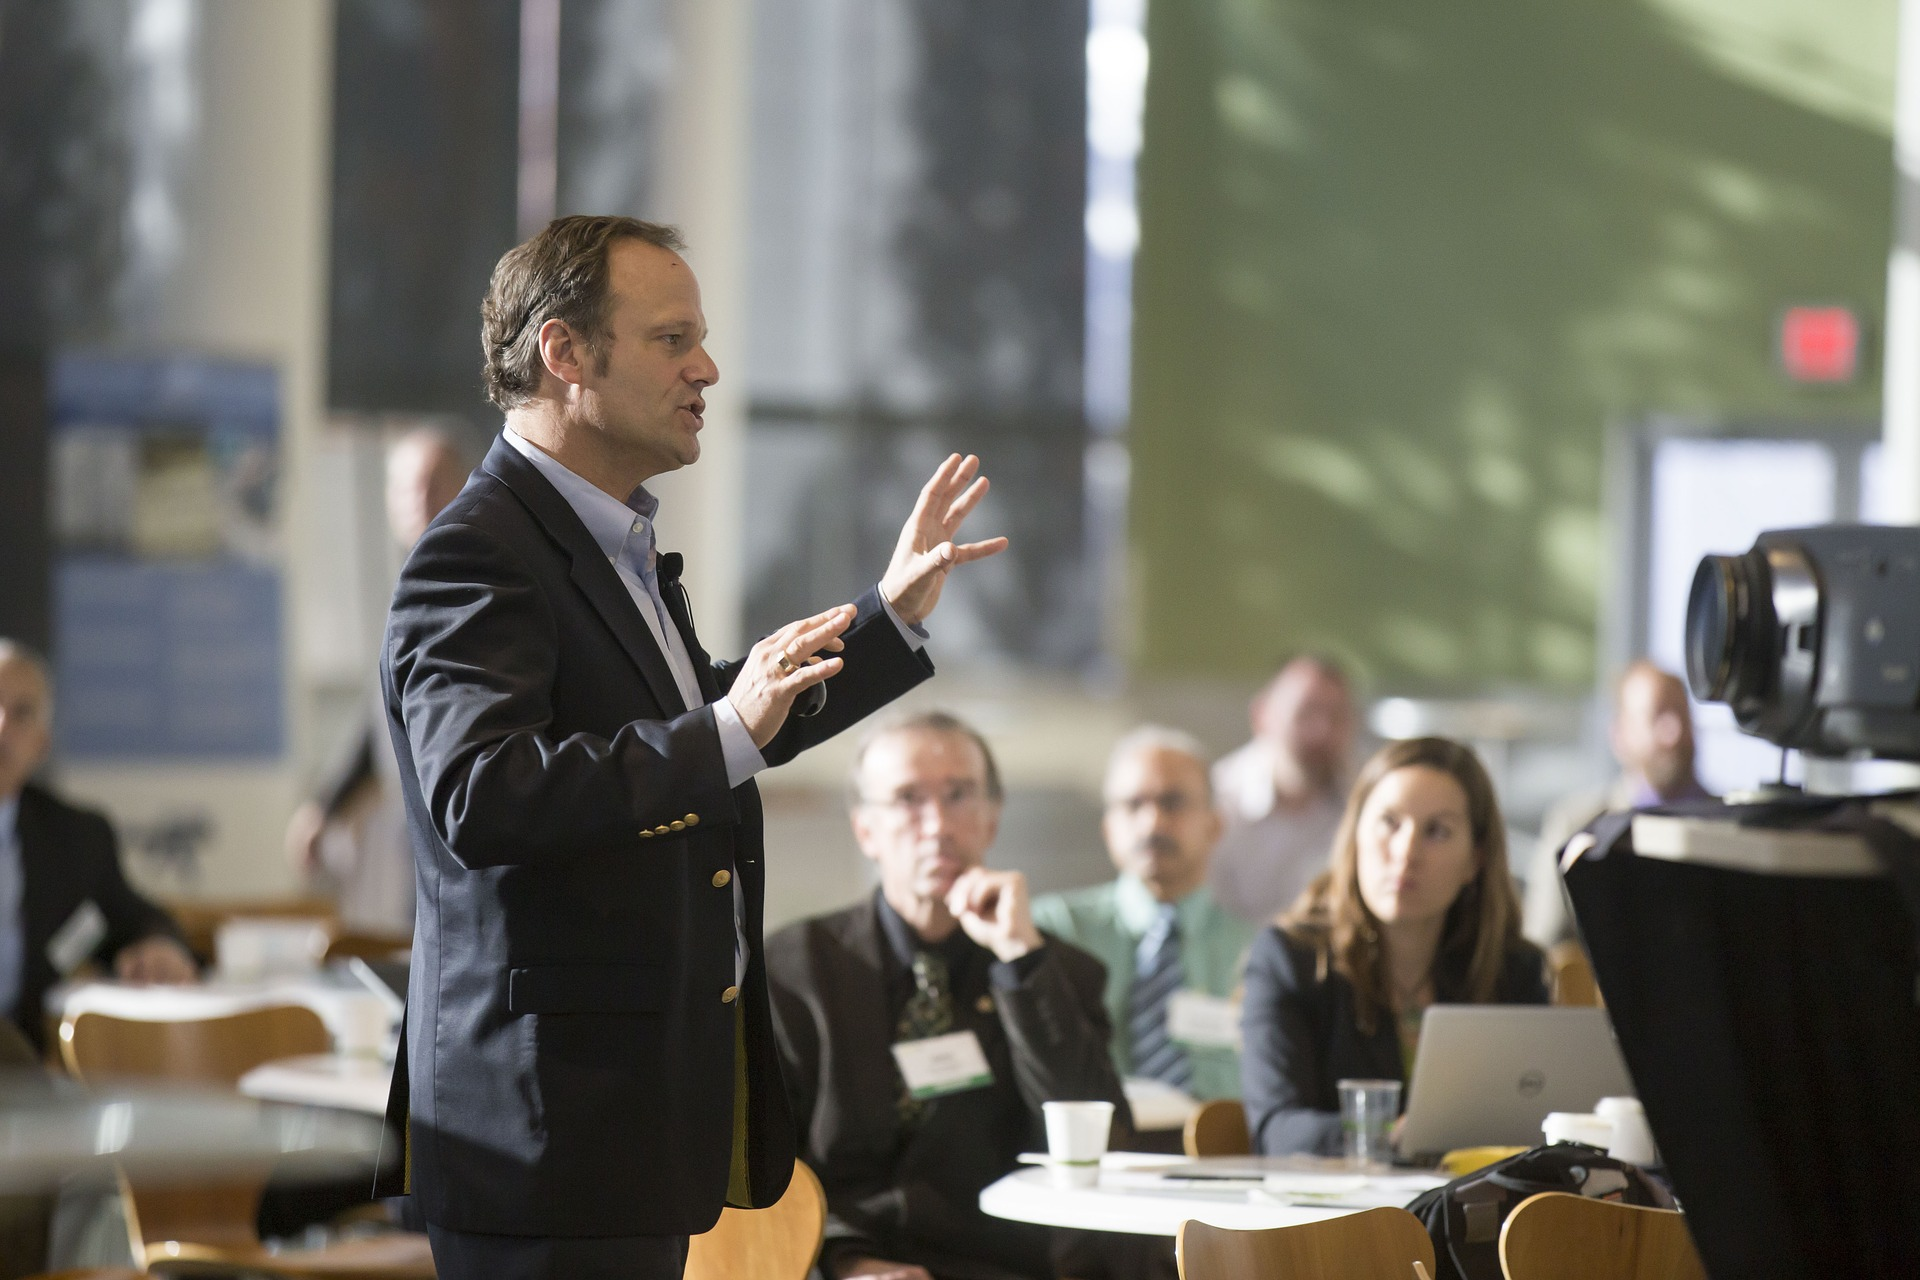 Building Confidence Before a Big Presentation